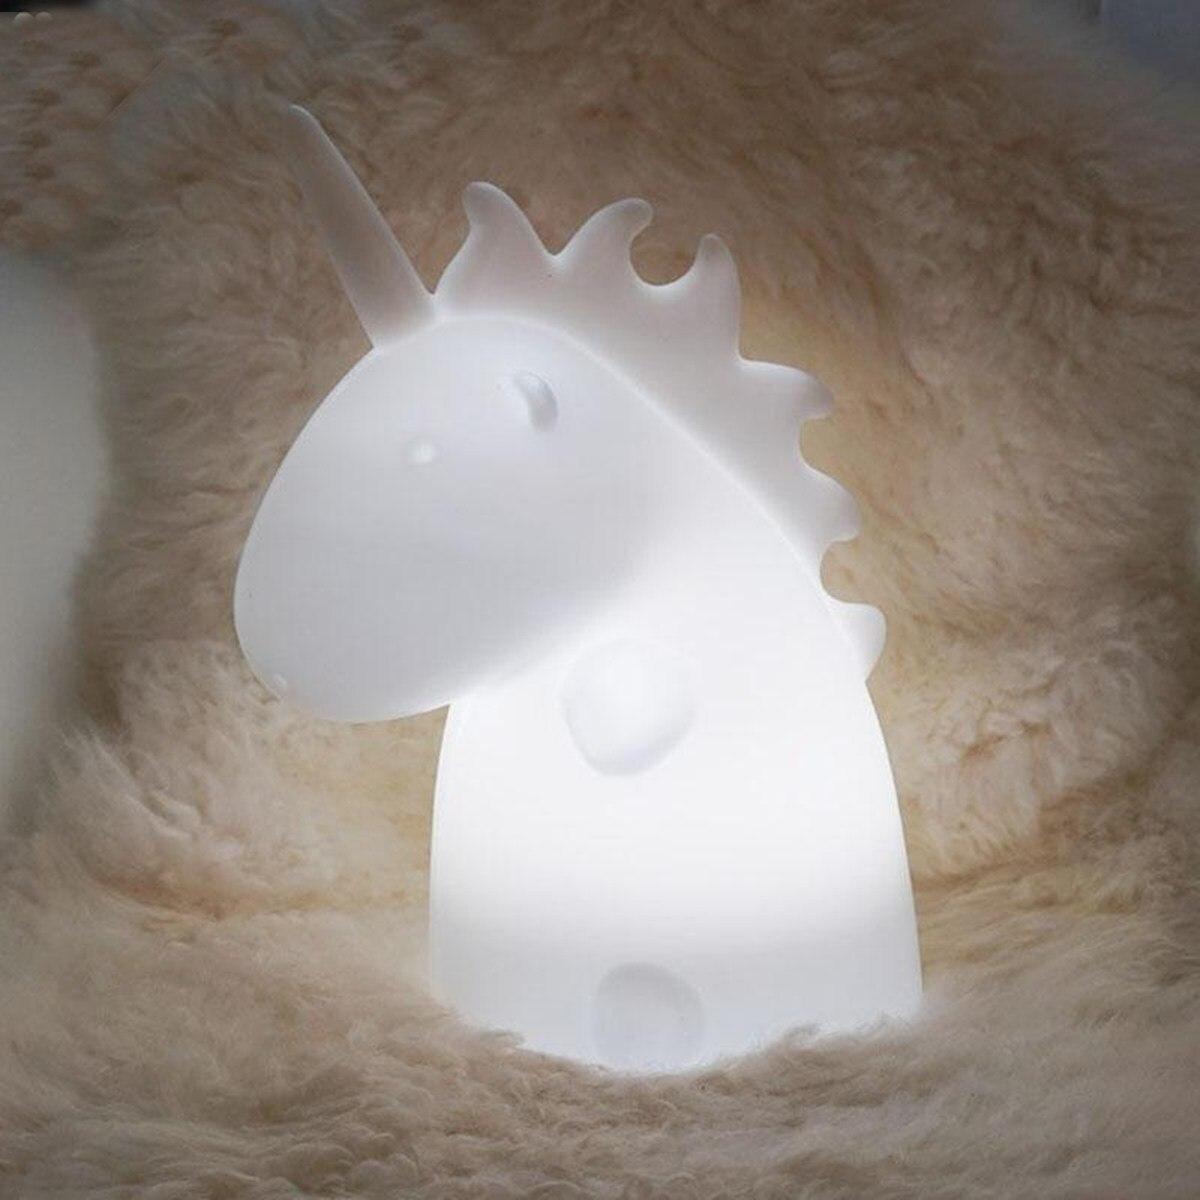 Luzes da Noite home decor presente da festa Marca : Smuxi